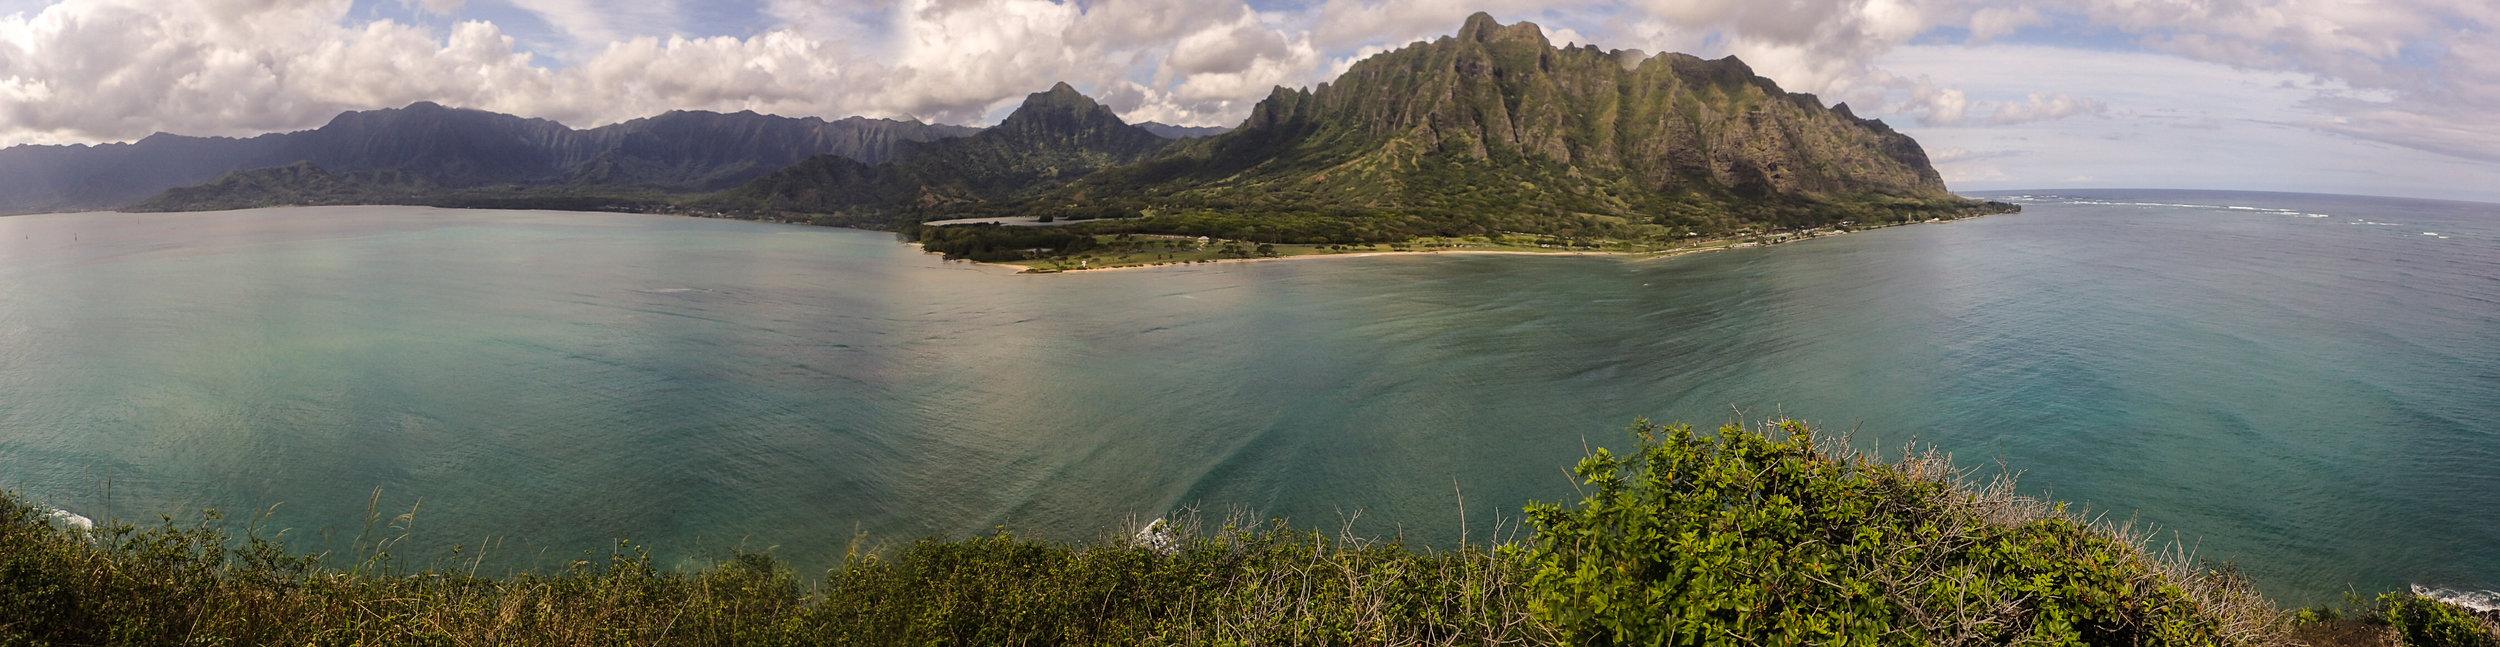 P_Tr_HI_Oahu_Olympus Images-376.jpg